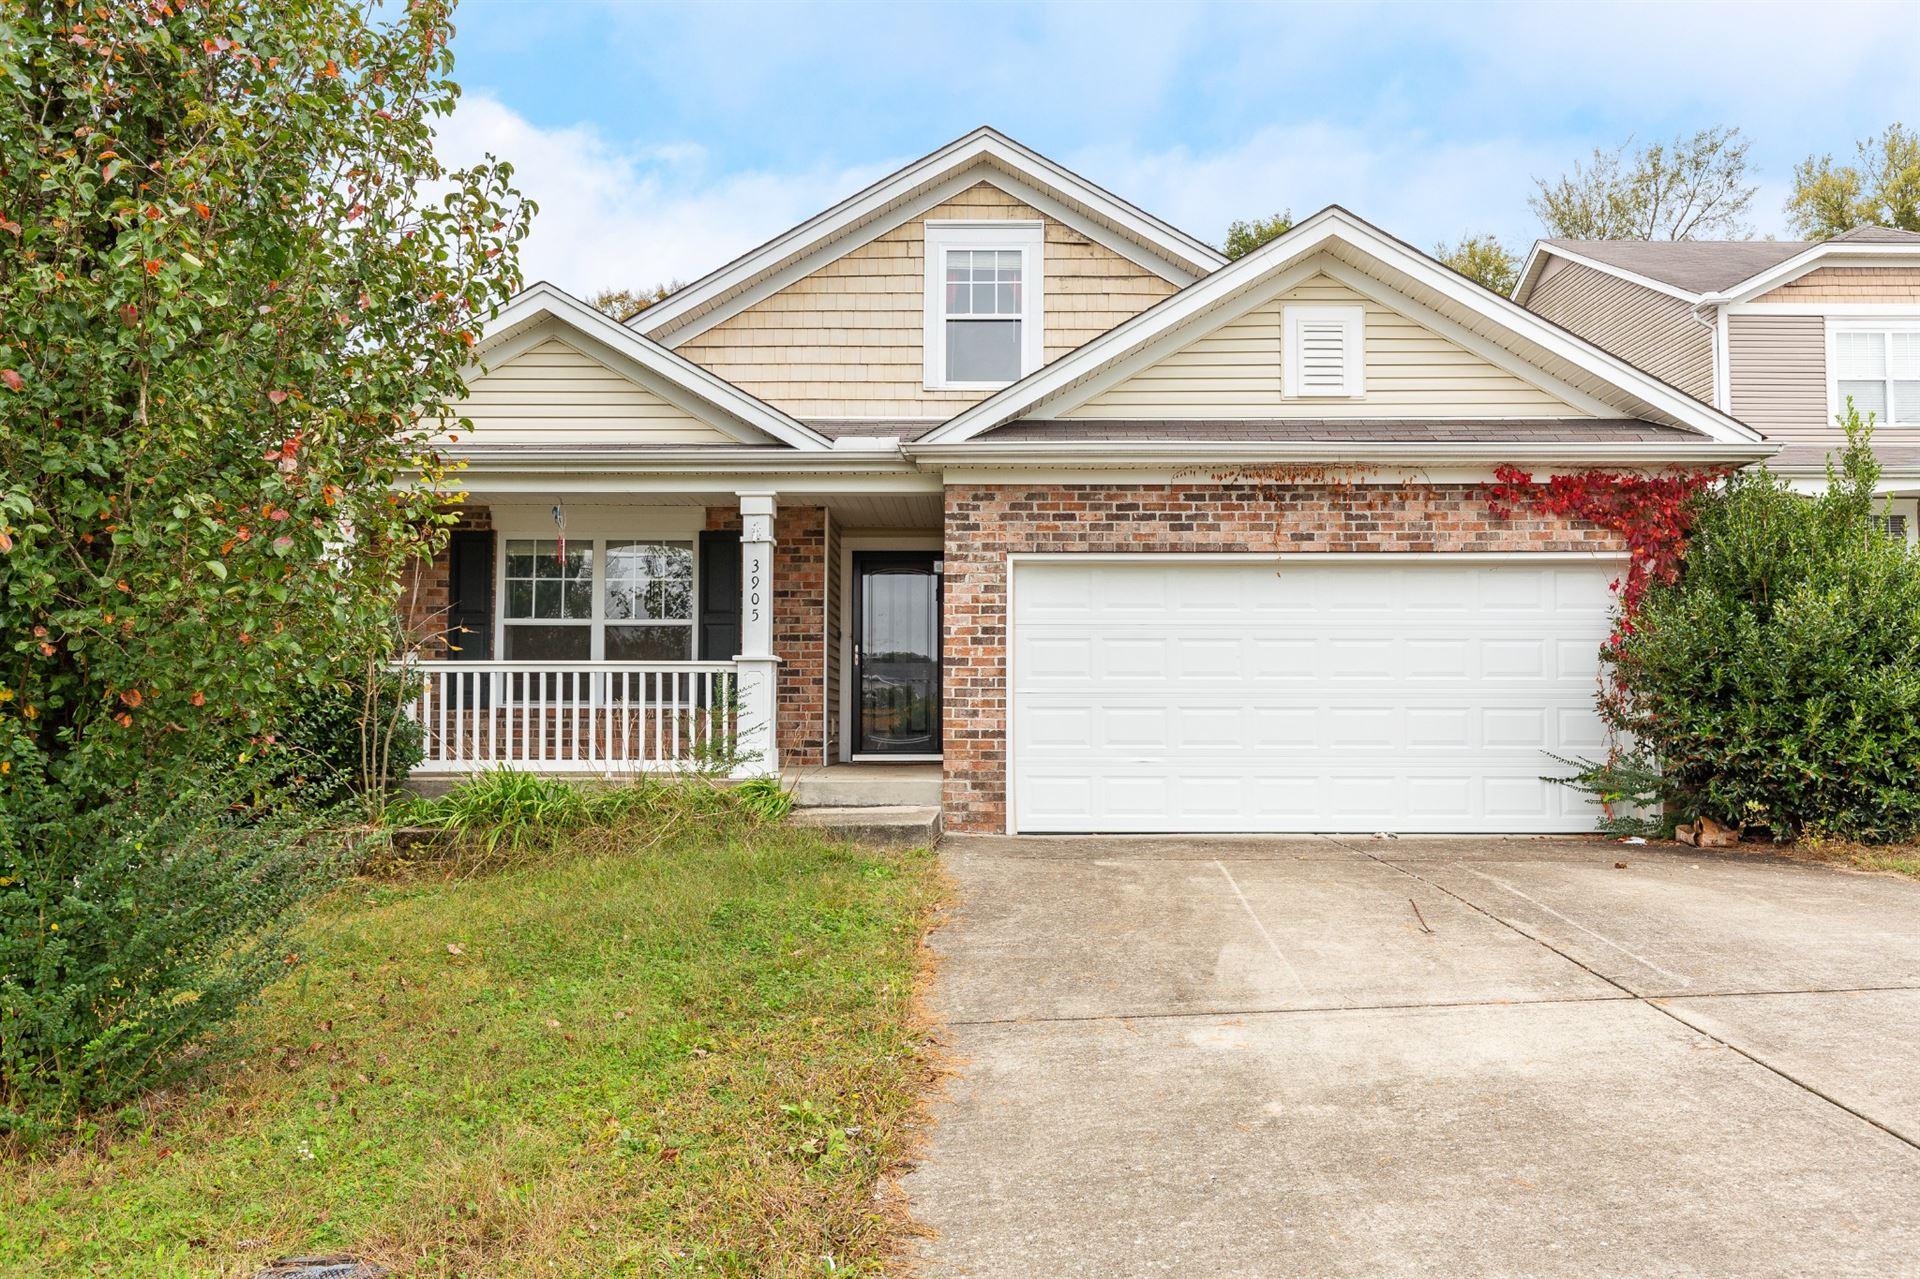 3905 Stephens Ridge Way, Antioch, TN 37013 - MLS#: 2202762